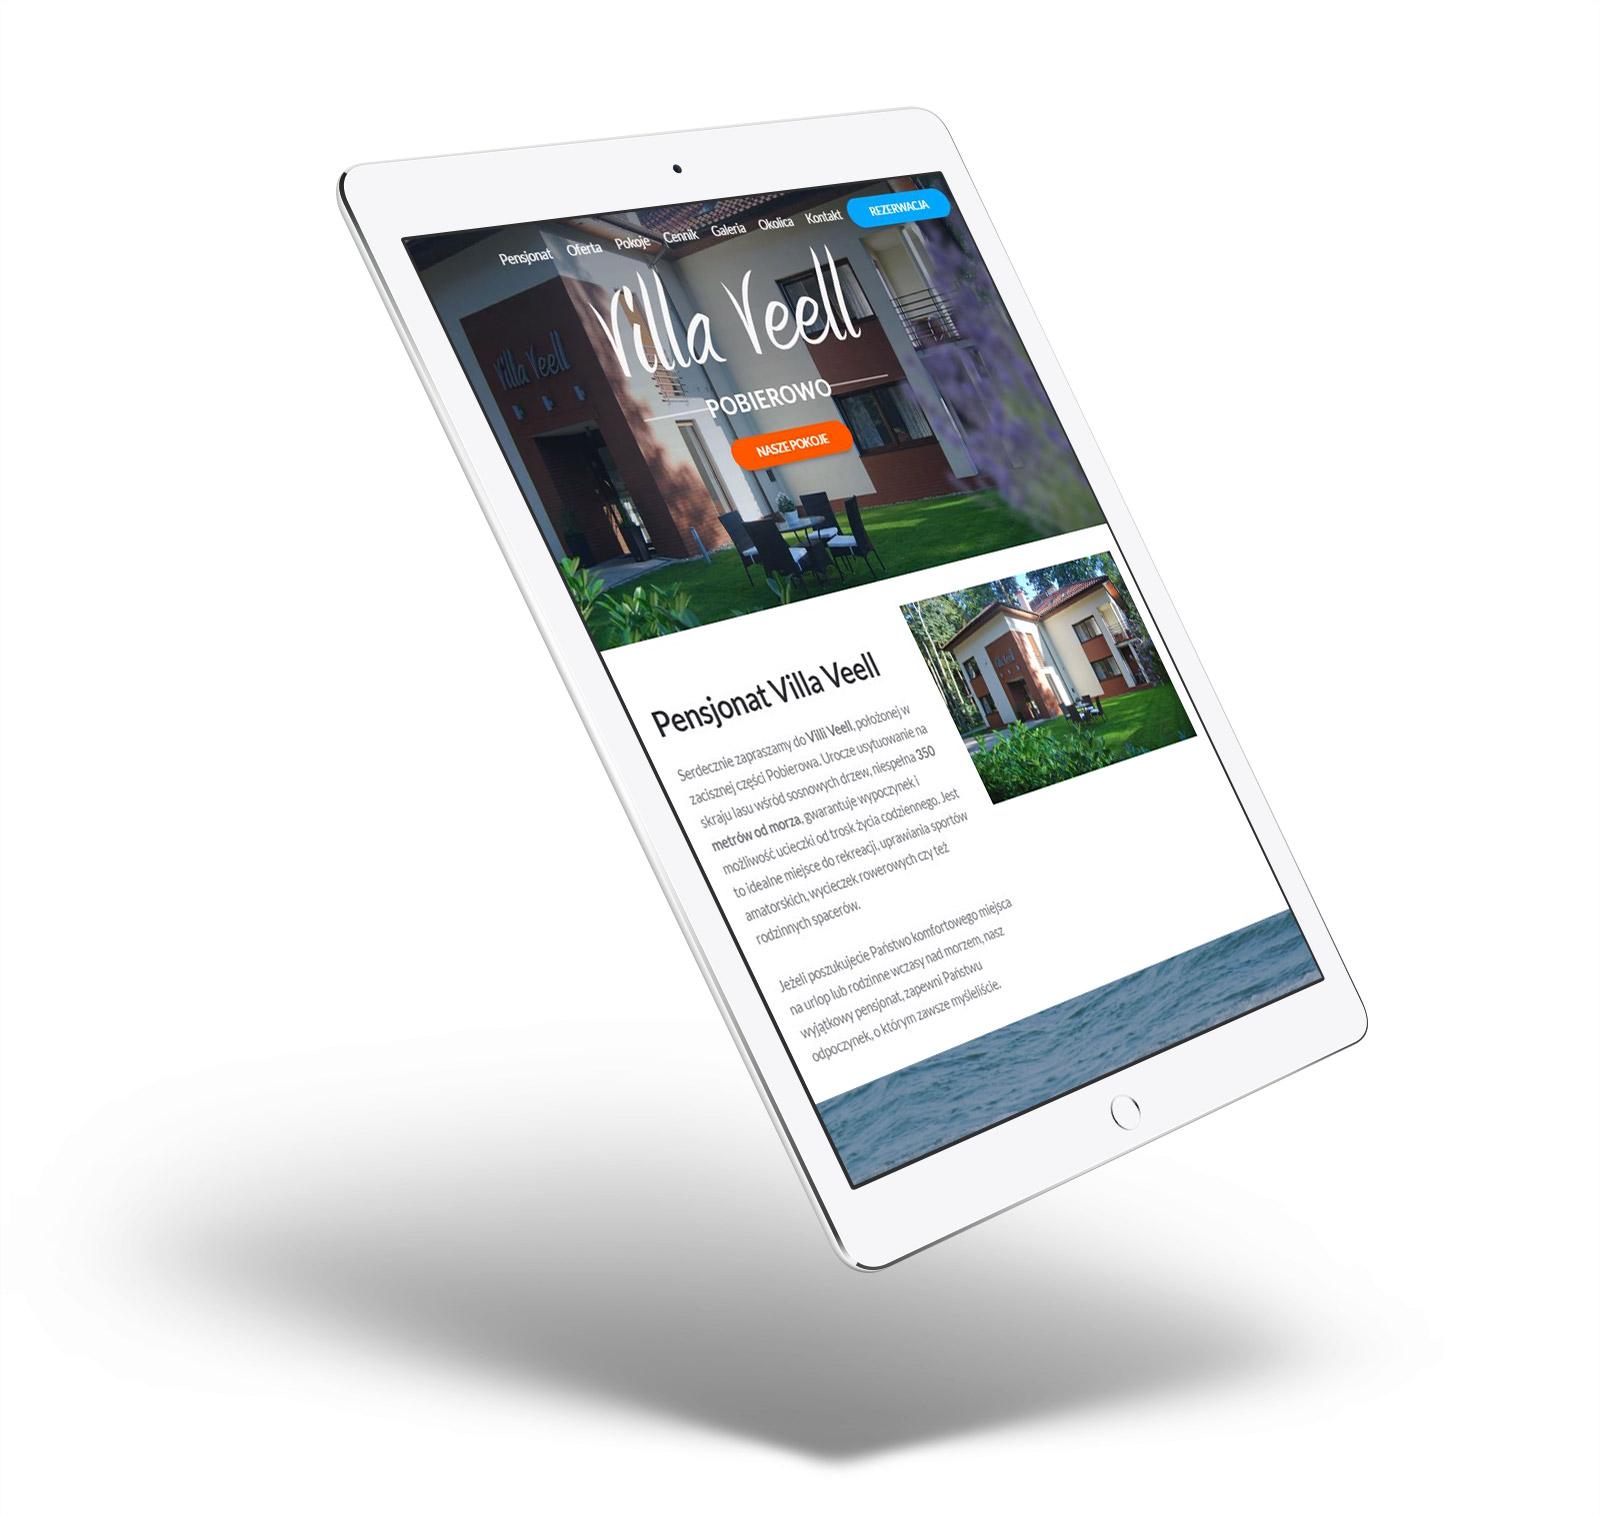 Villa Veell - strona internetowa, pensjonat Pobierowo